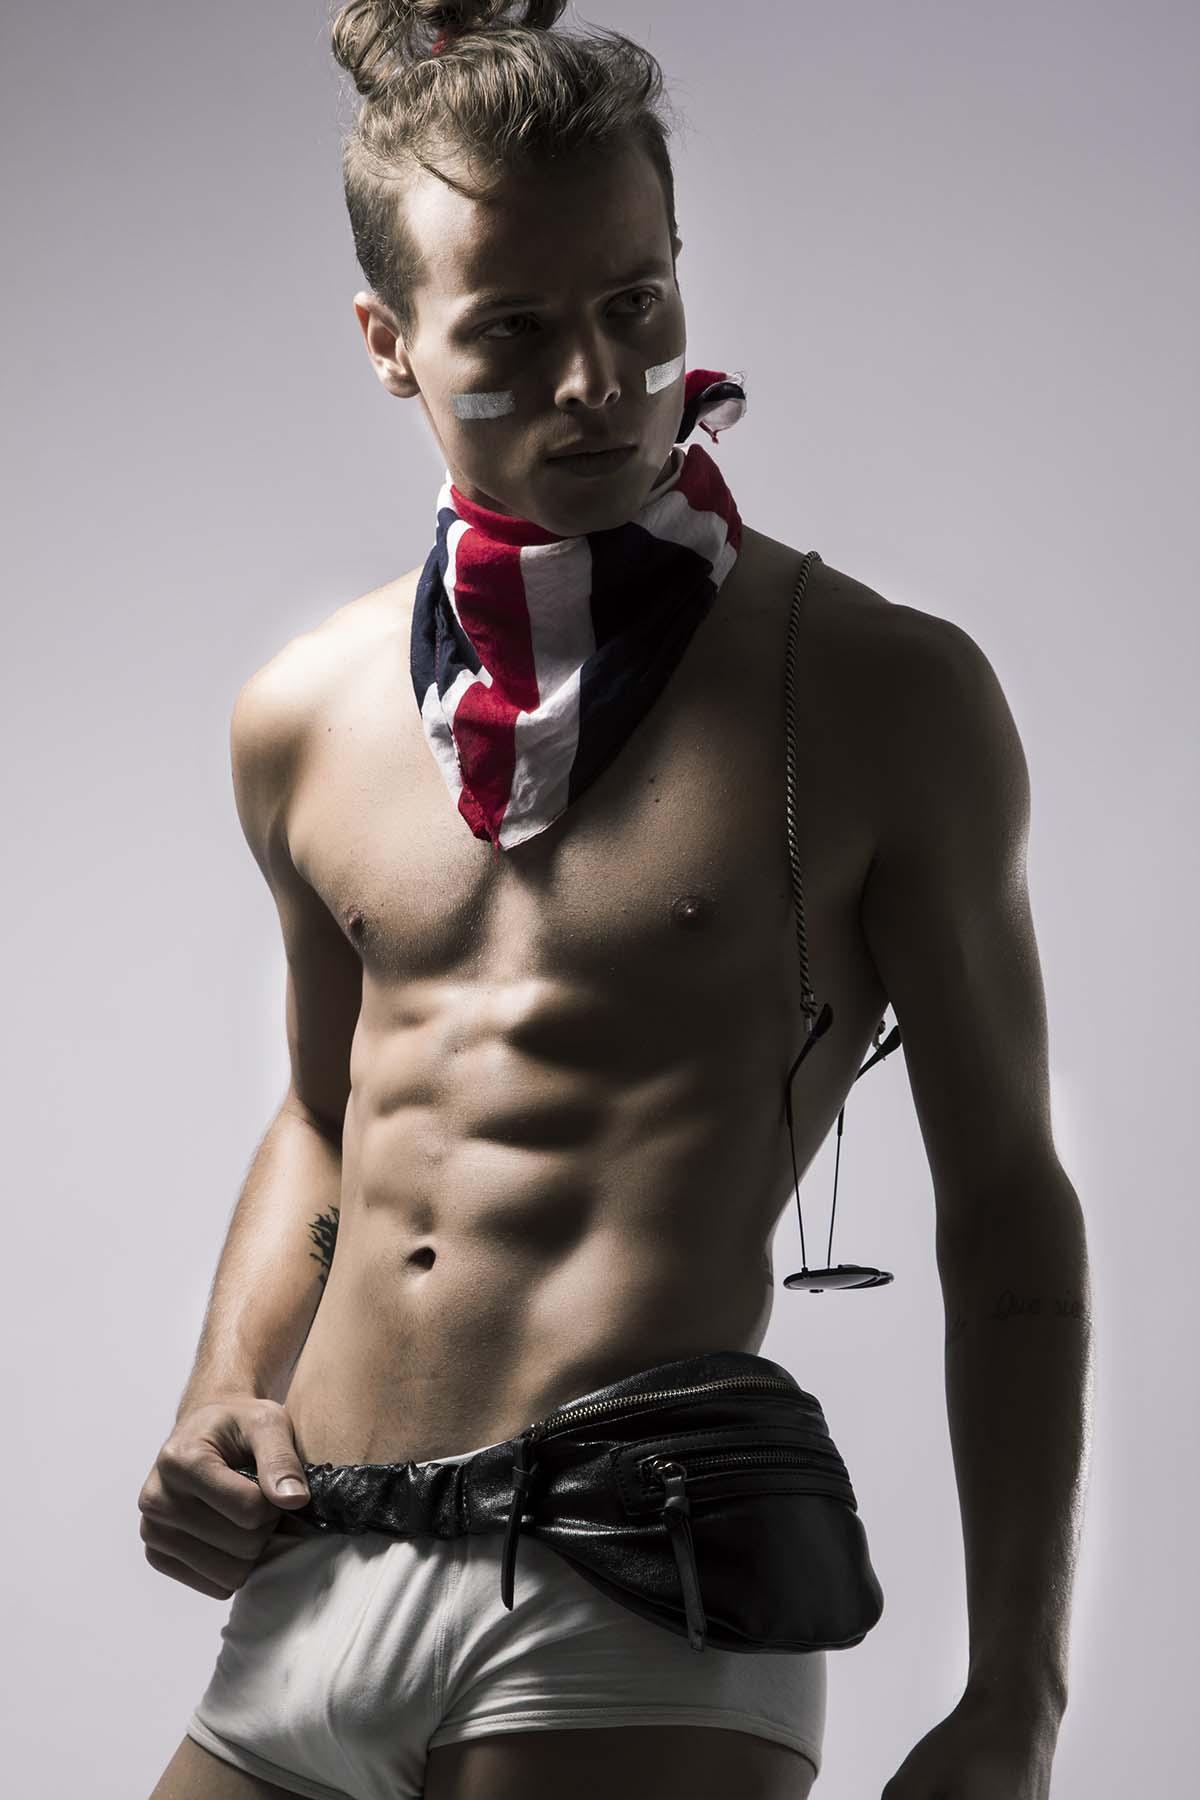 Tales Cotta by Matheus Muraca for Brazilian Male Model